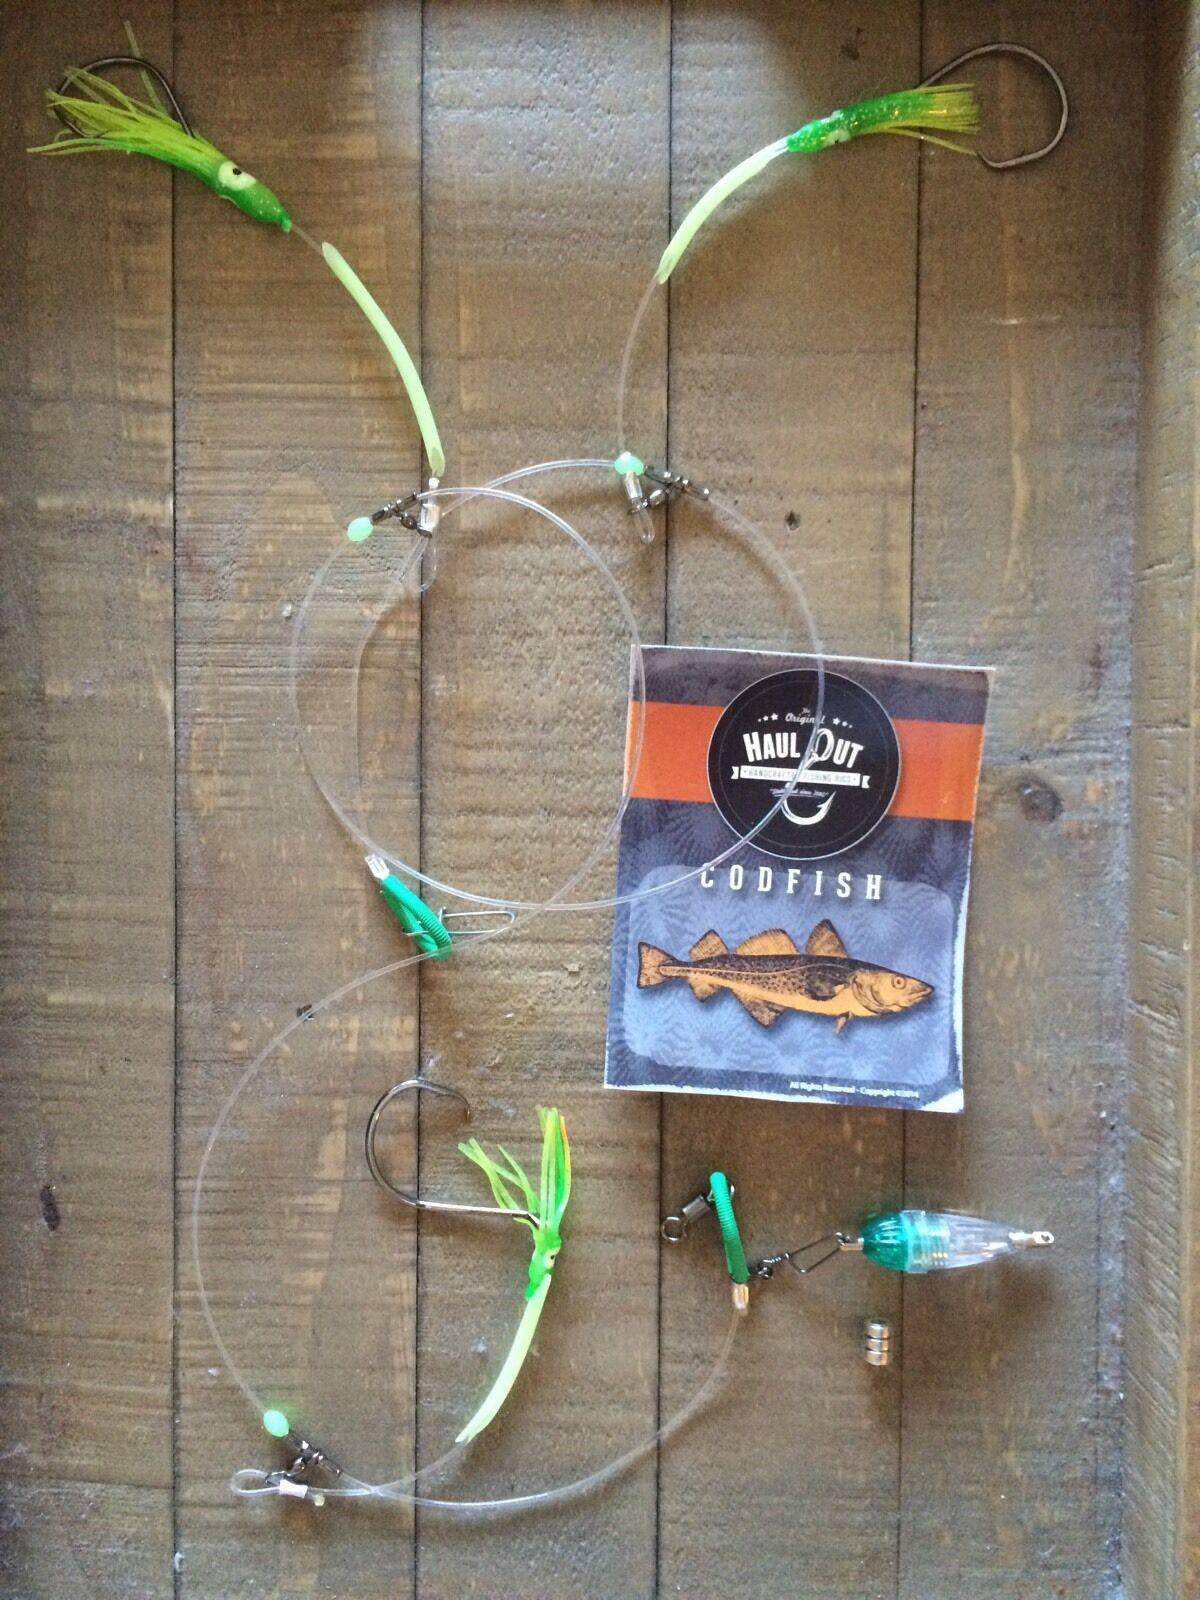 9 CODFISH GROUPER rot SNAPPER FISHING RIG deep drop light and glow 3 hooks    T